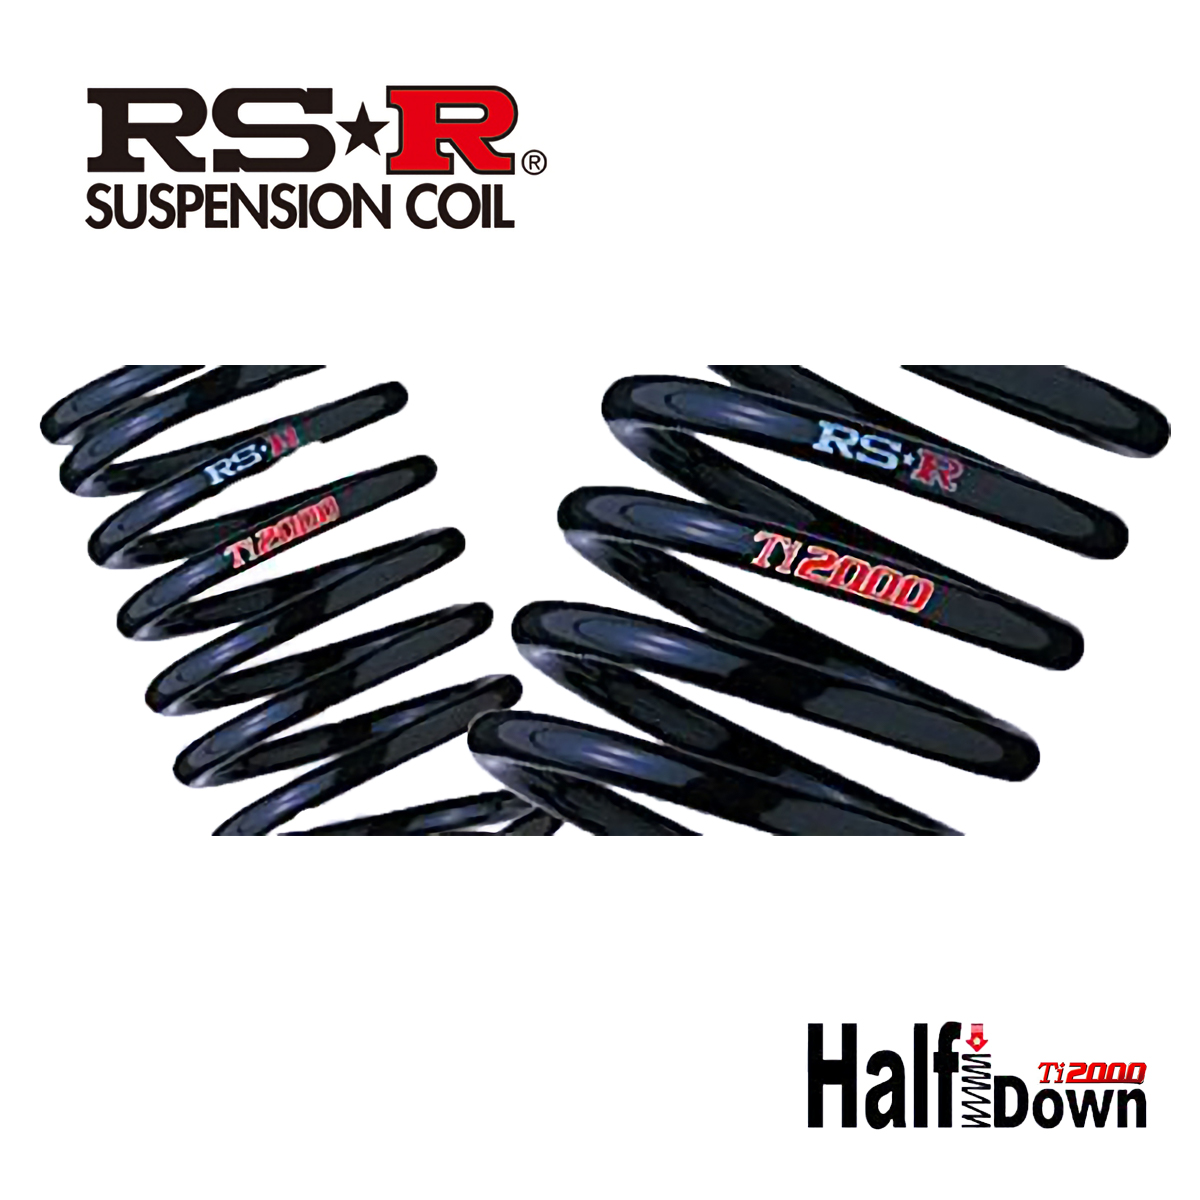 RS-R エブリィバン/スクラムバン PC DA17V/DG17V ダウンサス S652TW Ti2000 ダウン RSR 個人宅発送追金有